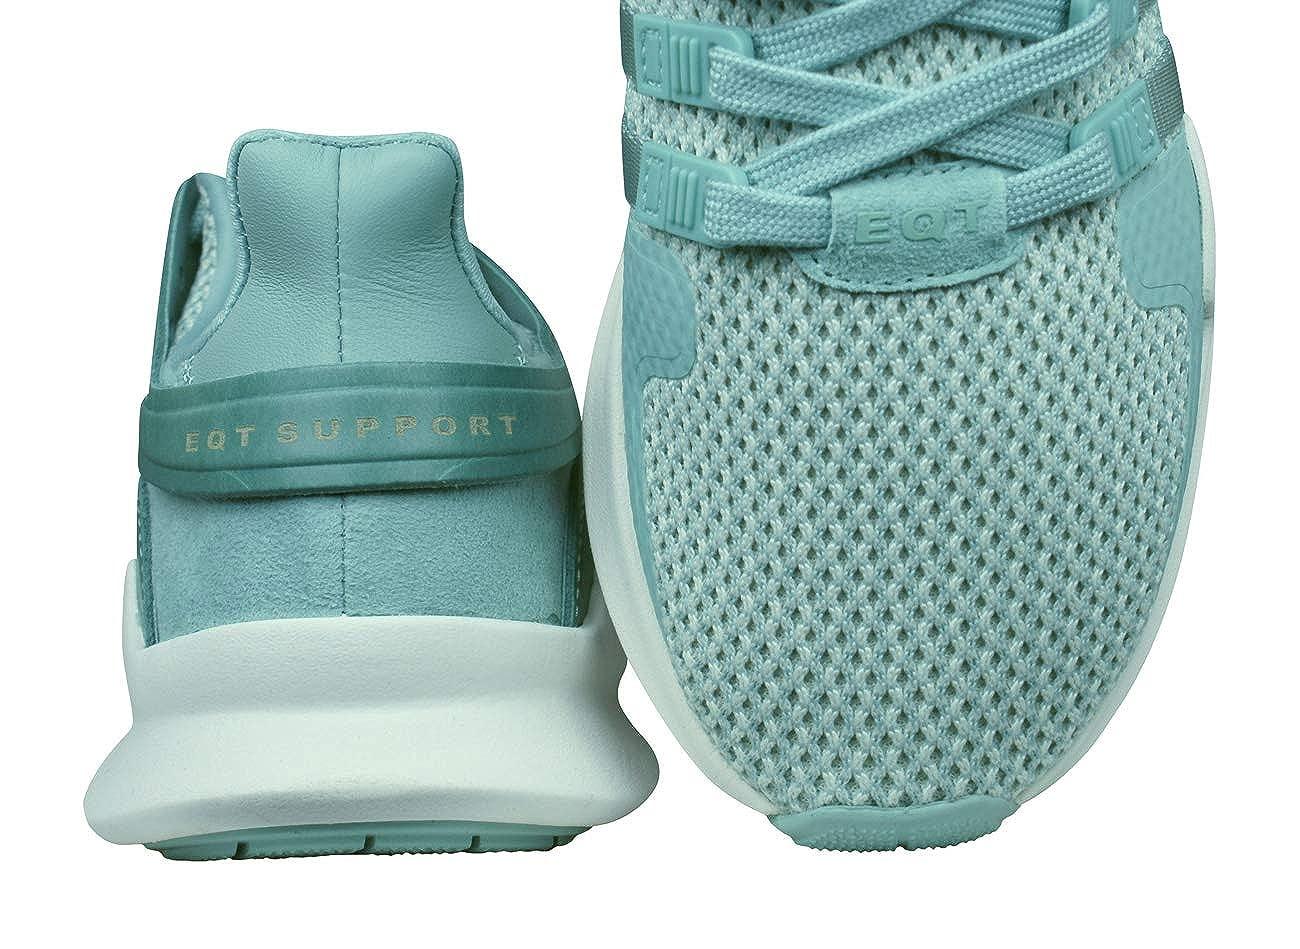 Adidas EQT Support ADV 792 792 792 scarpe da ginnastica Unisex – Adulto | Ricca consegna puntuale  be94fa